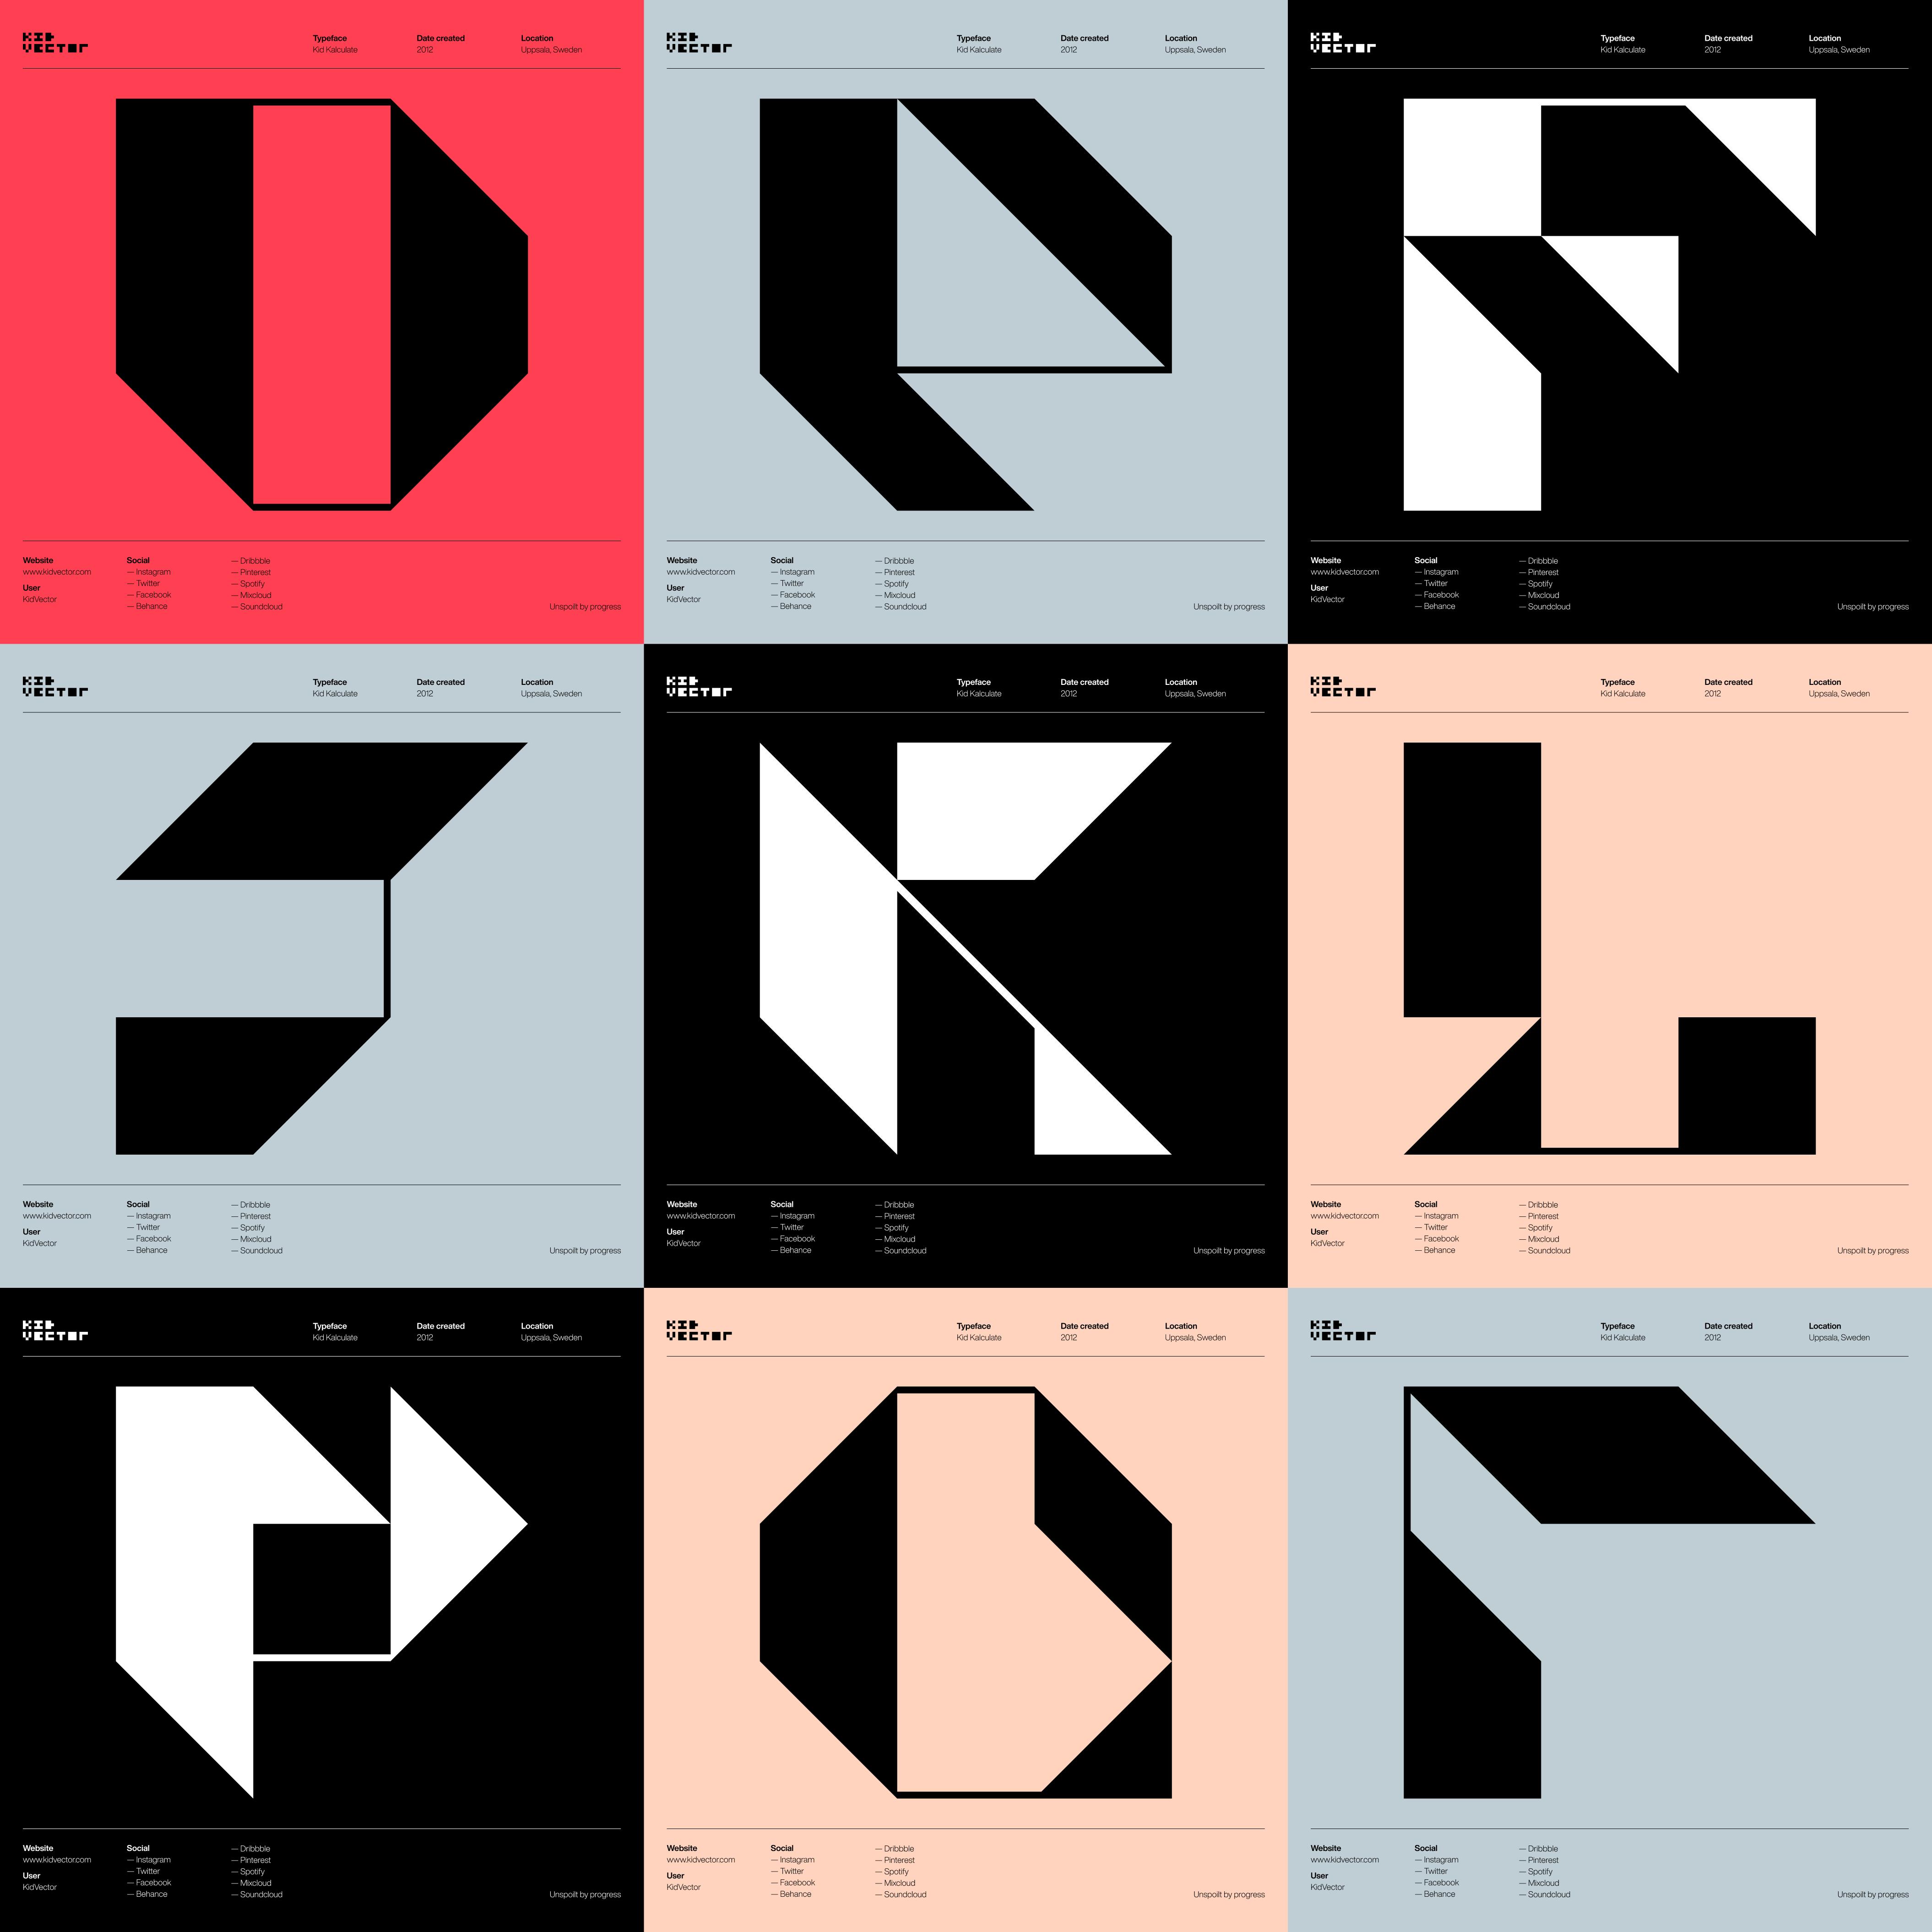 Kid Kalculate — 3 x 3 character grid 2